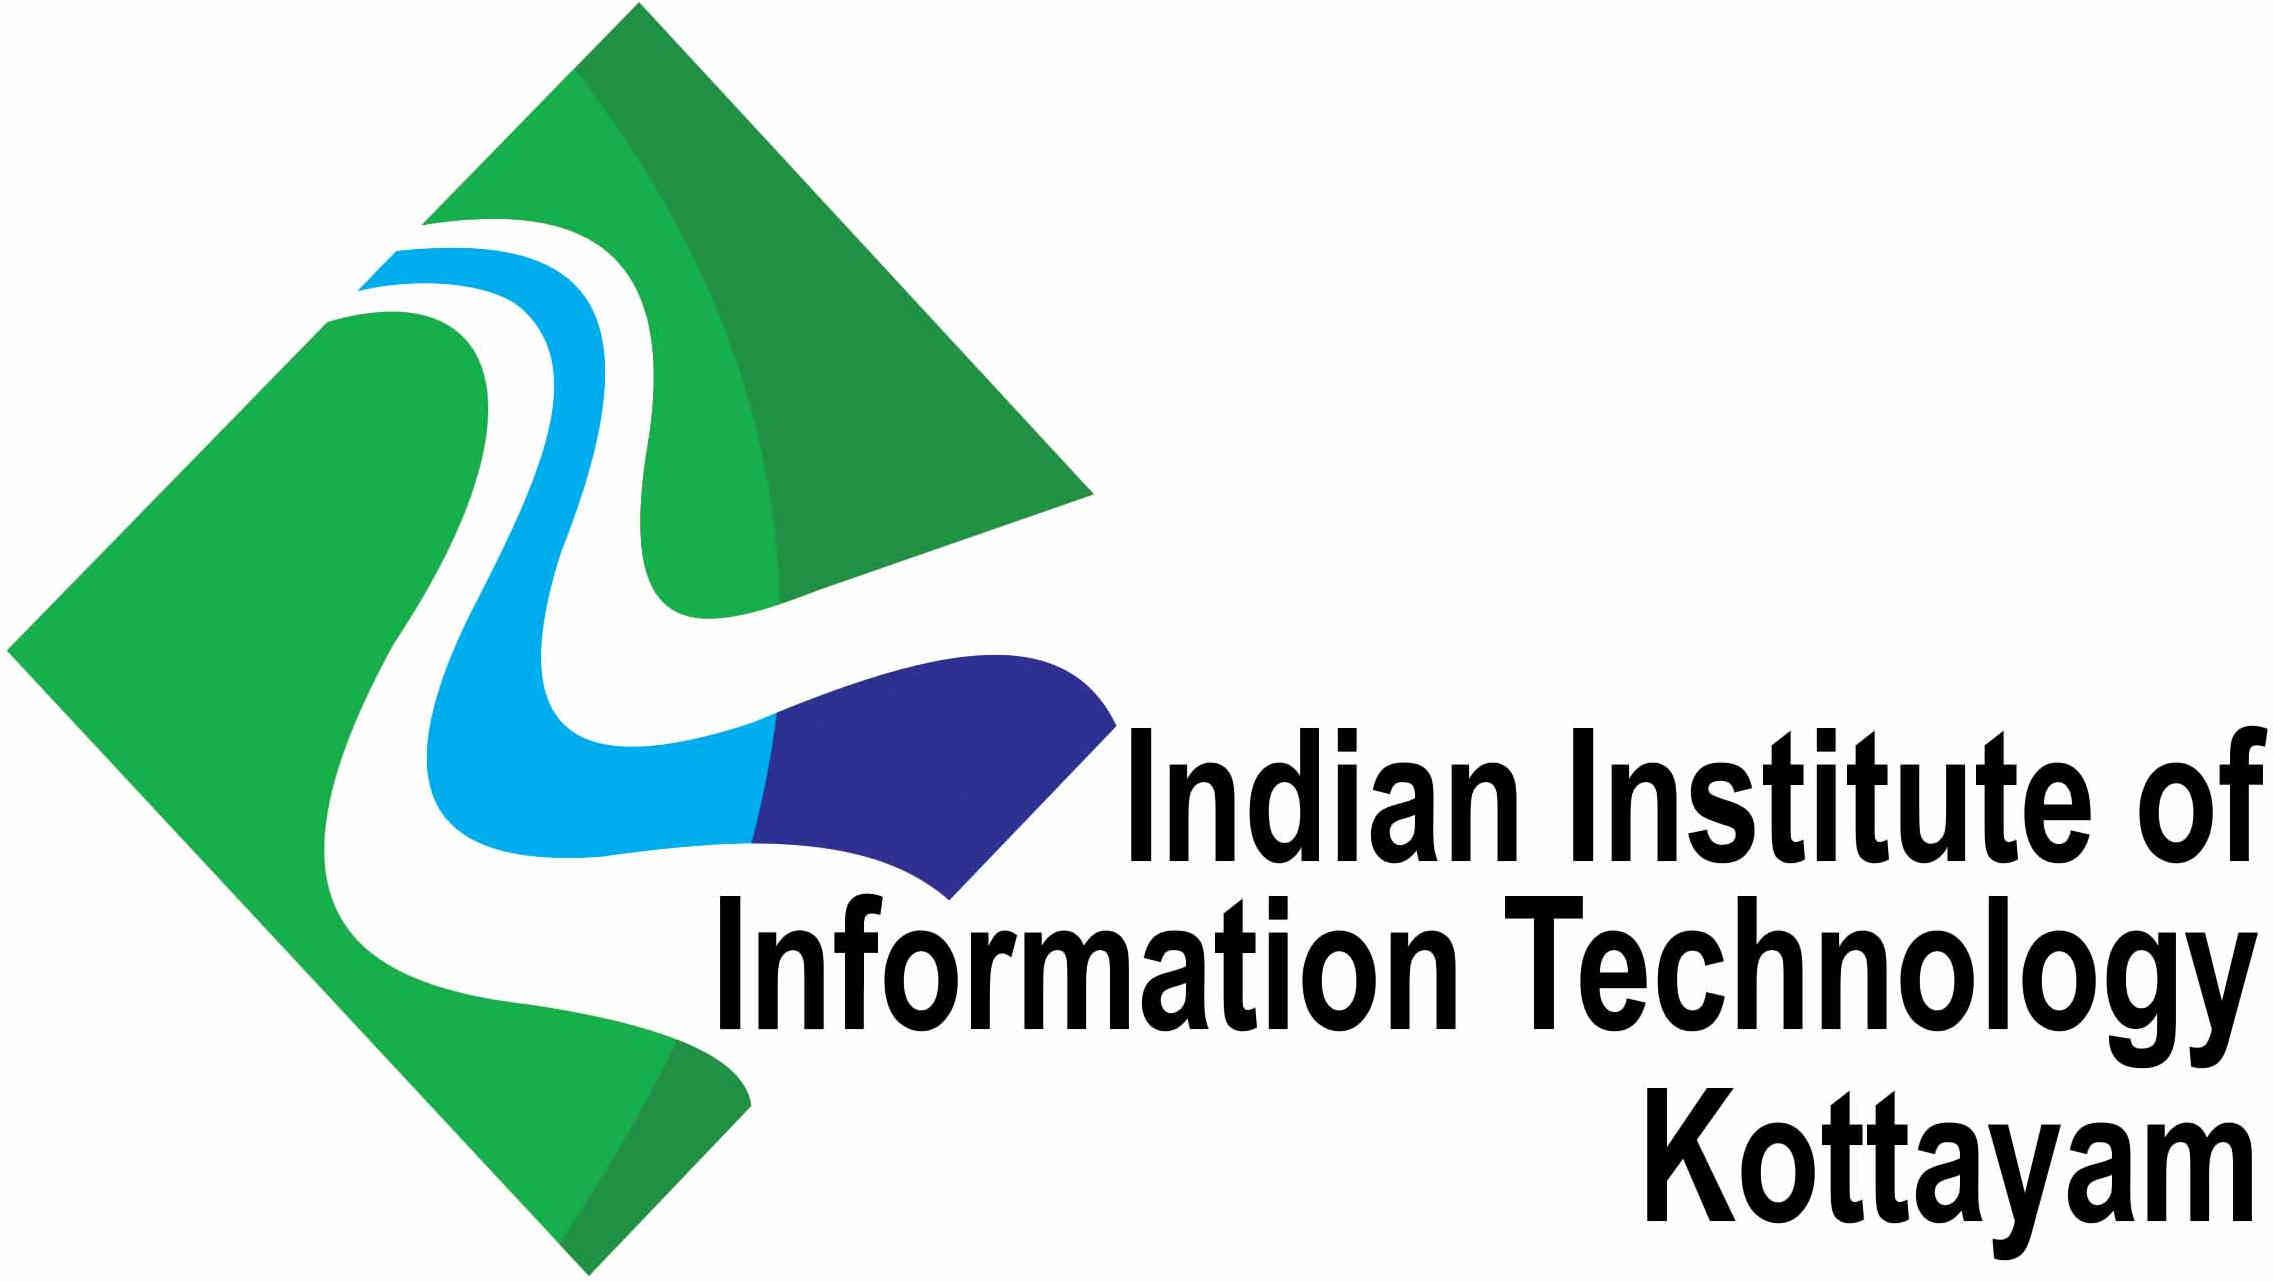 IIIT (Indian Institute of Information Technology), Kottayam